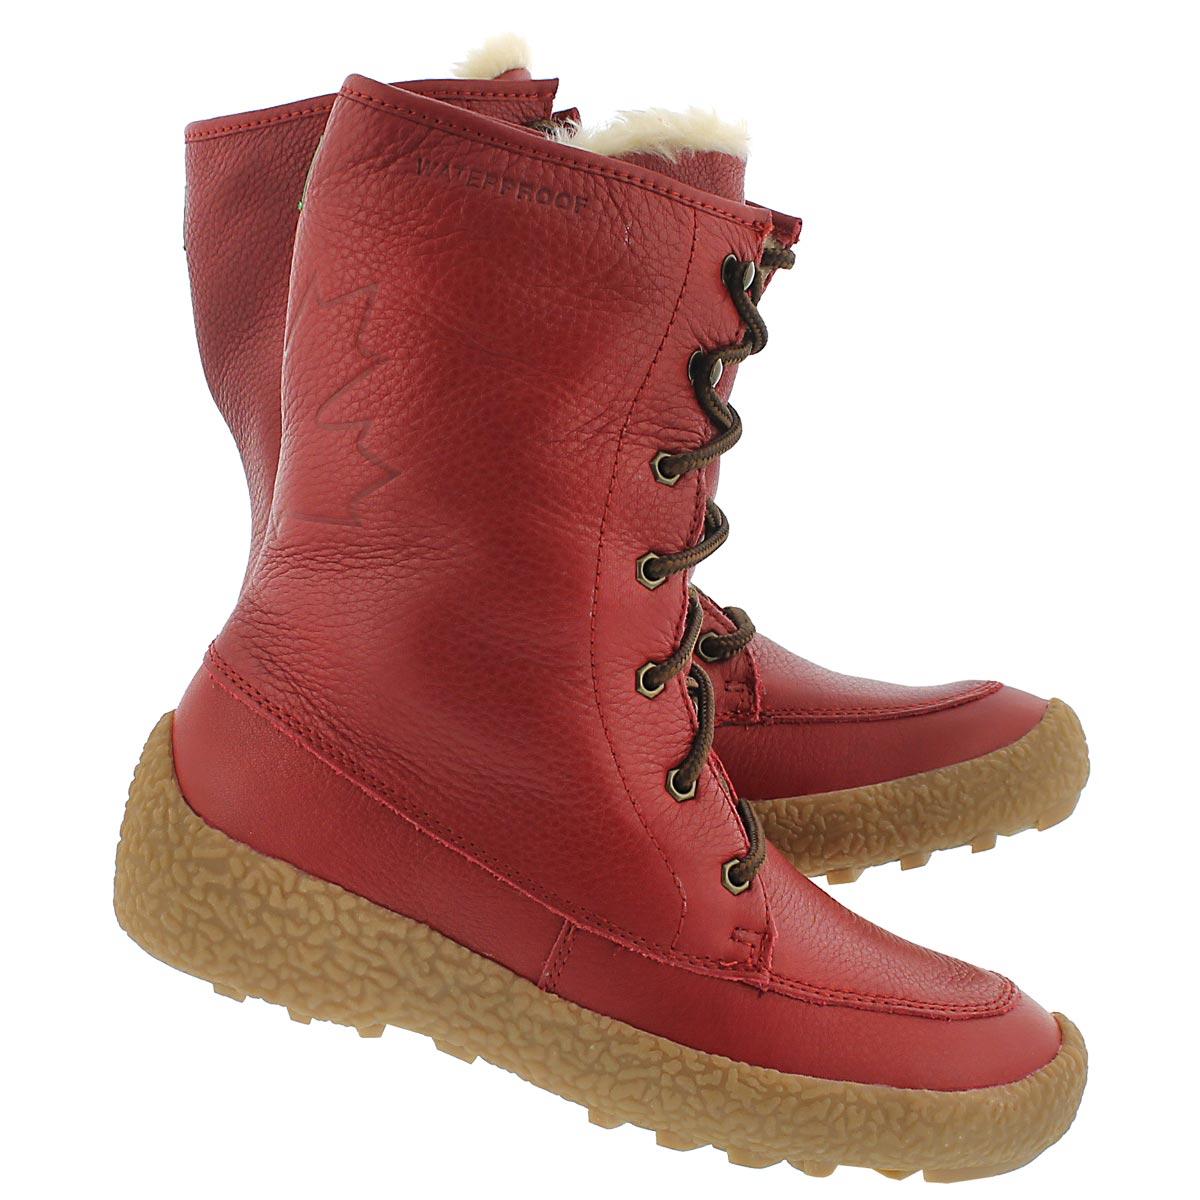 Lds Cheyenne red wtrpf winter boot